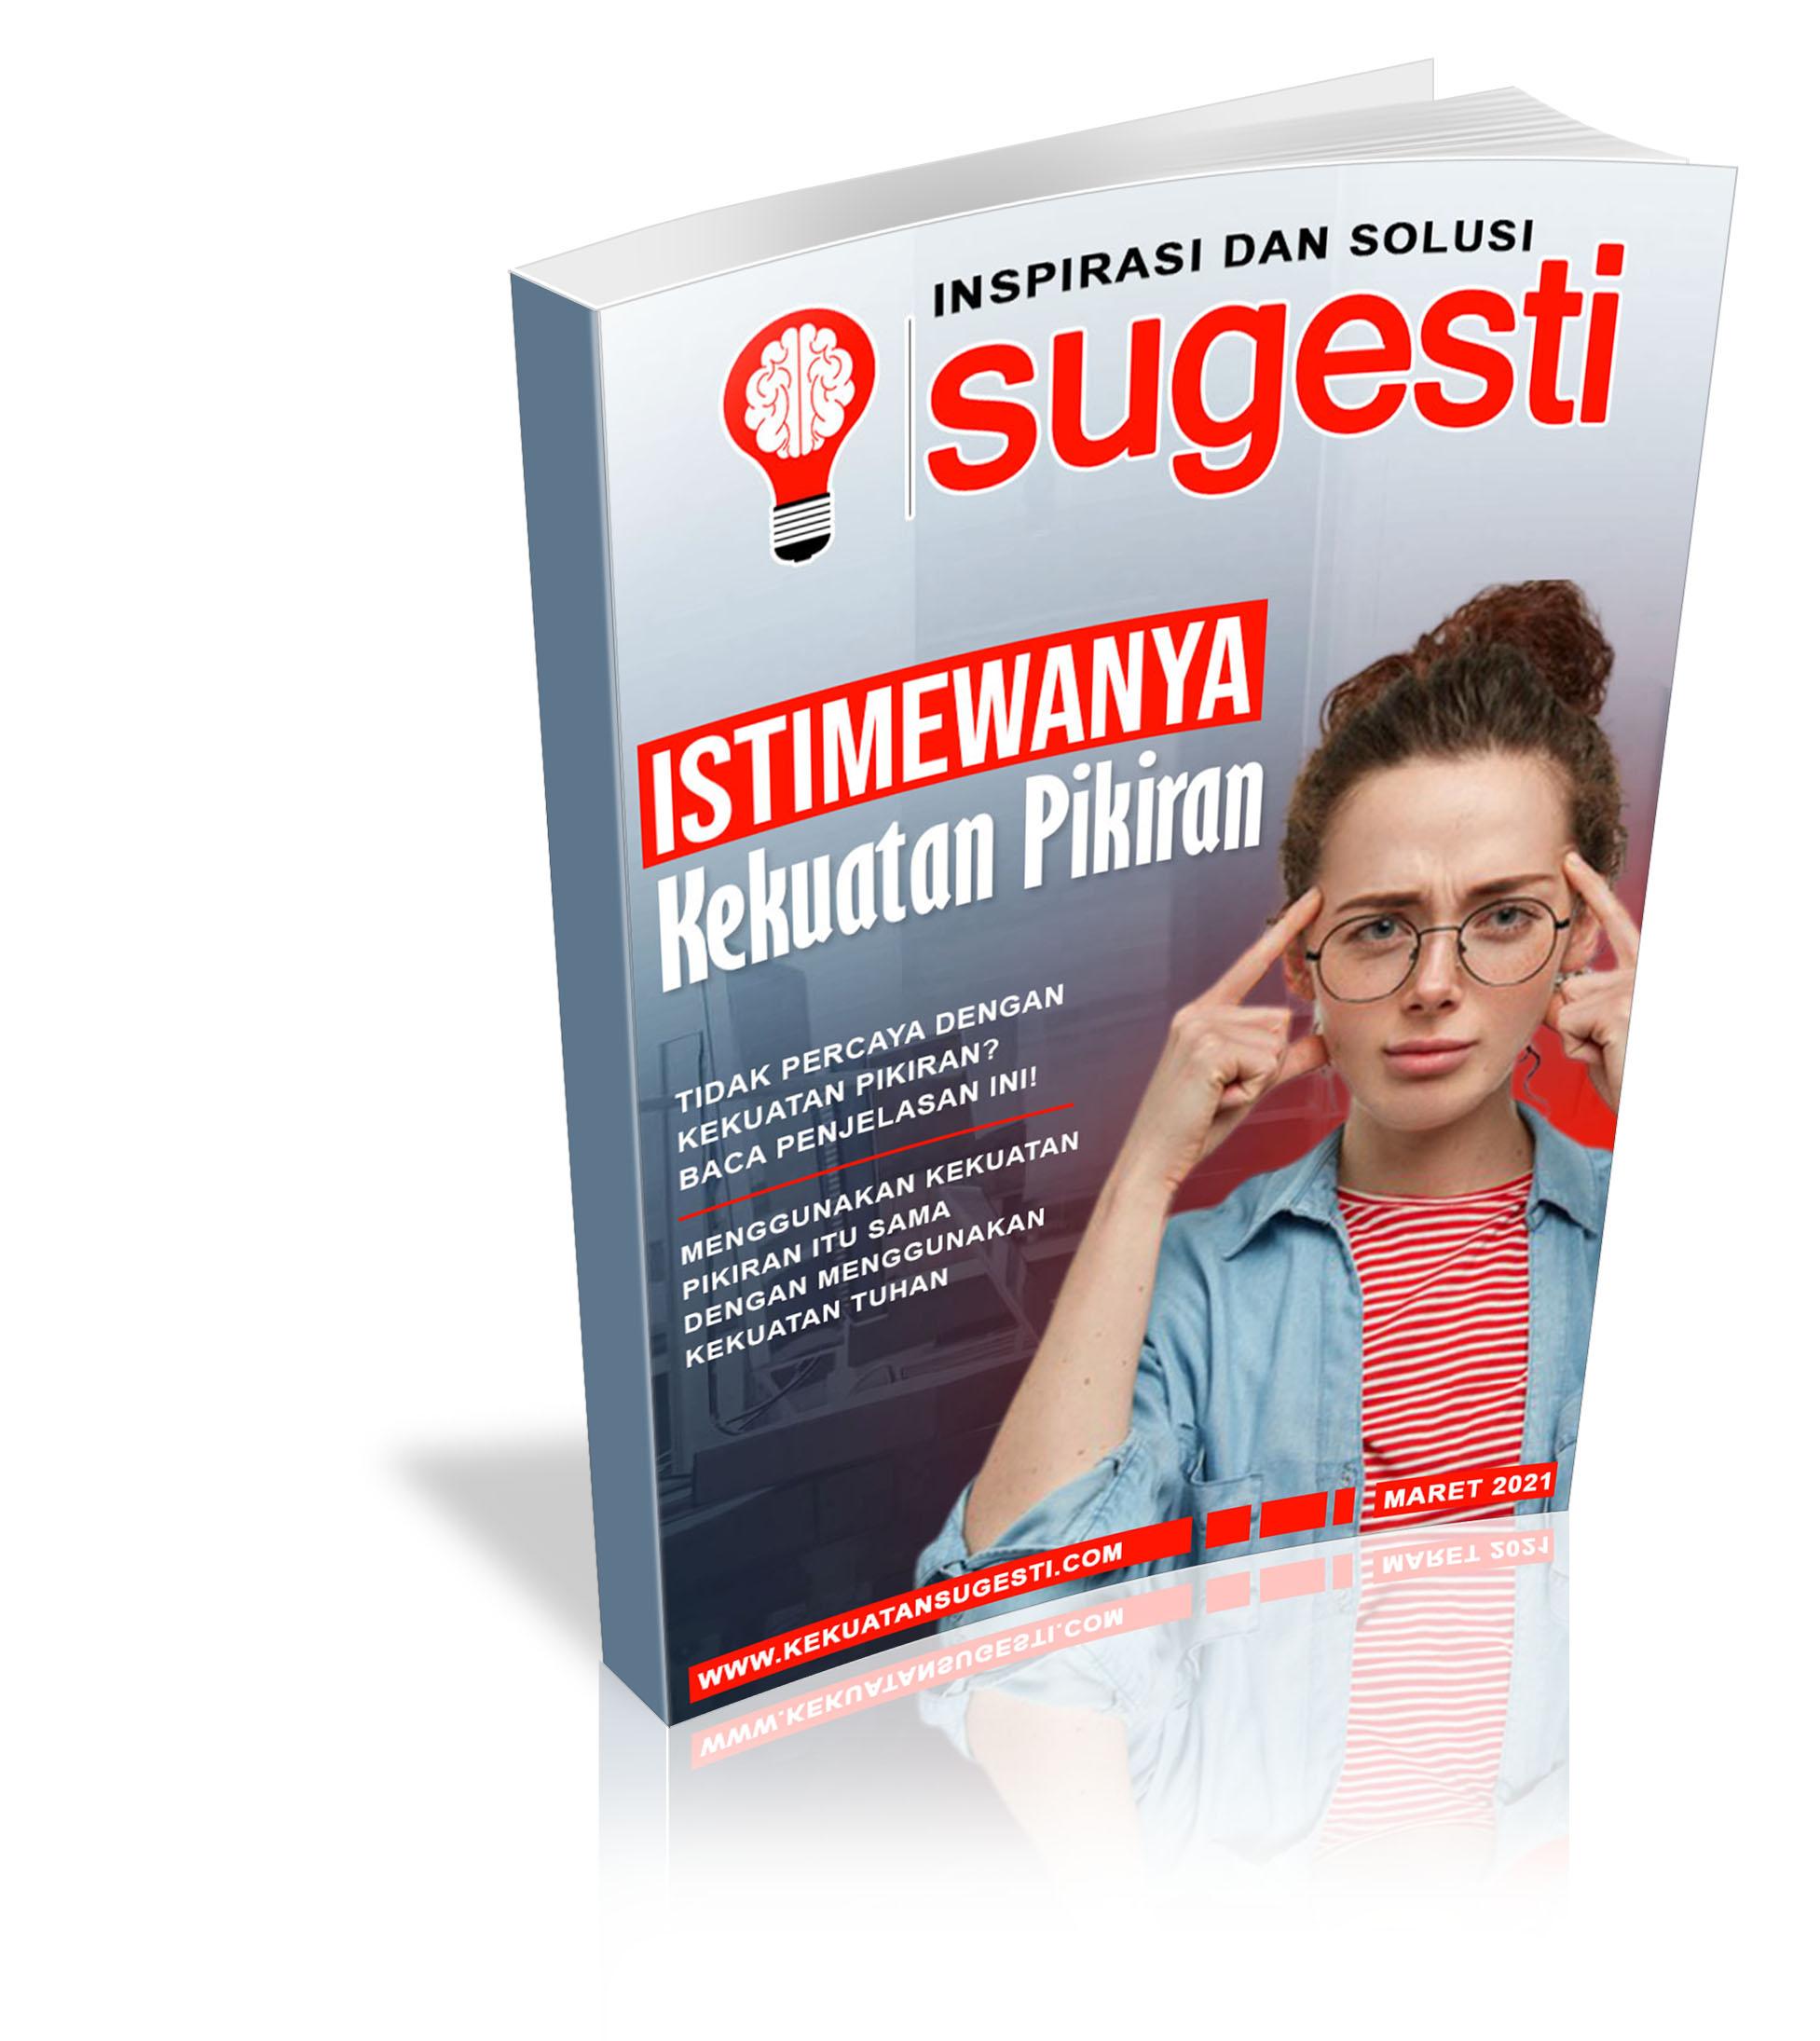 Majalah Sugesti Edisi ke Delapanpuluh Satu Bulan Maret 2021